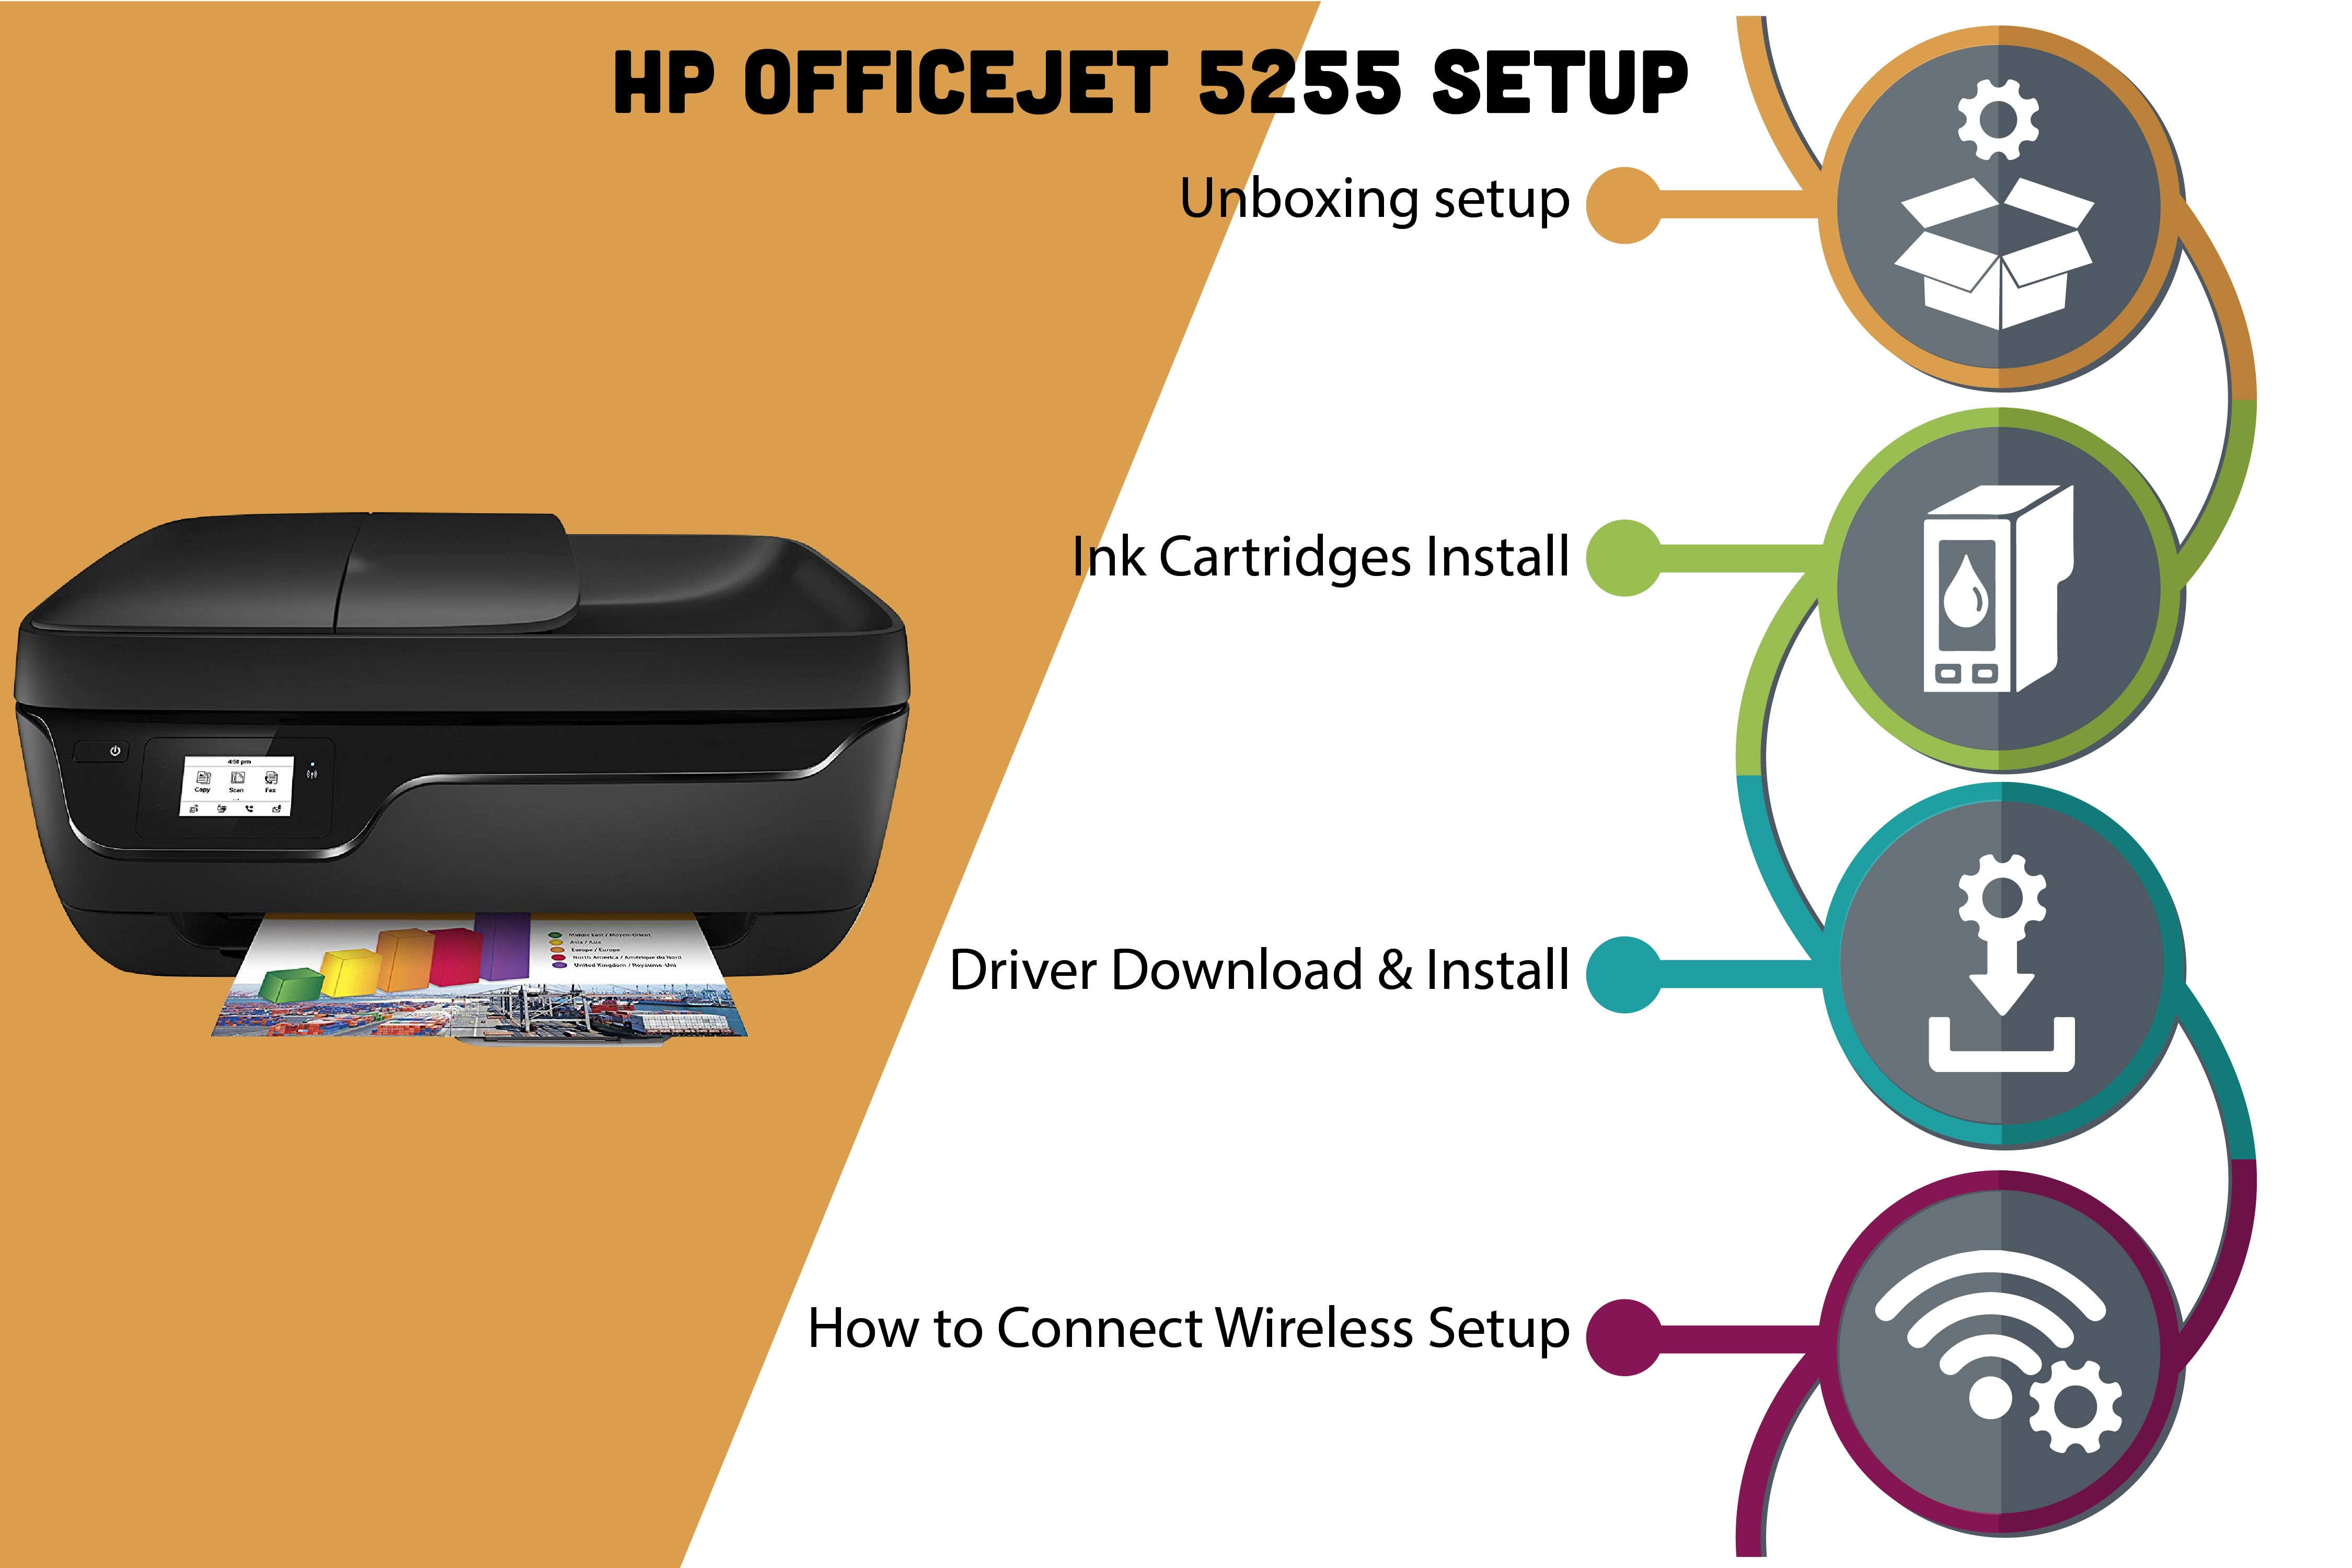 123 Hp Com Oj5255 Unboxing Wireless Setup Troubleshooting Printer Ink Cartridge Hp Officejet